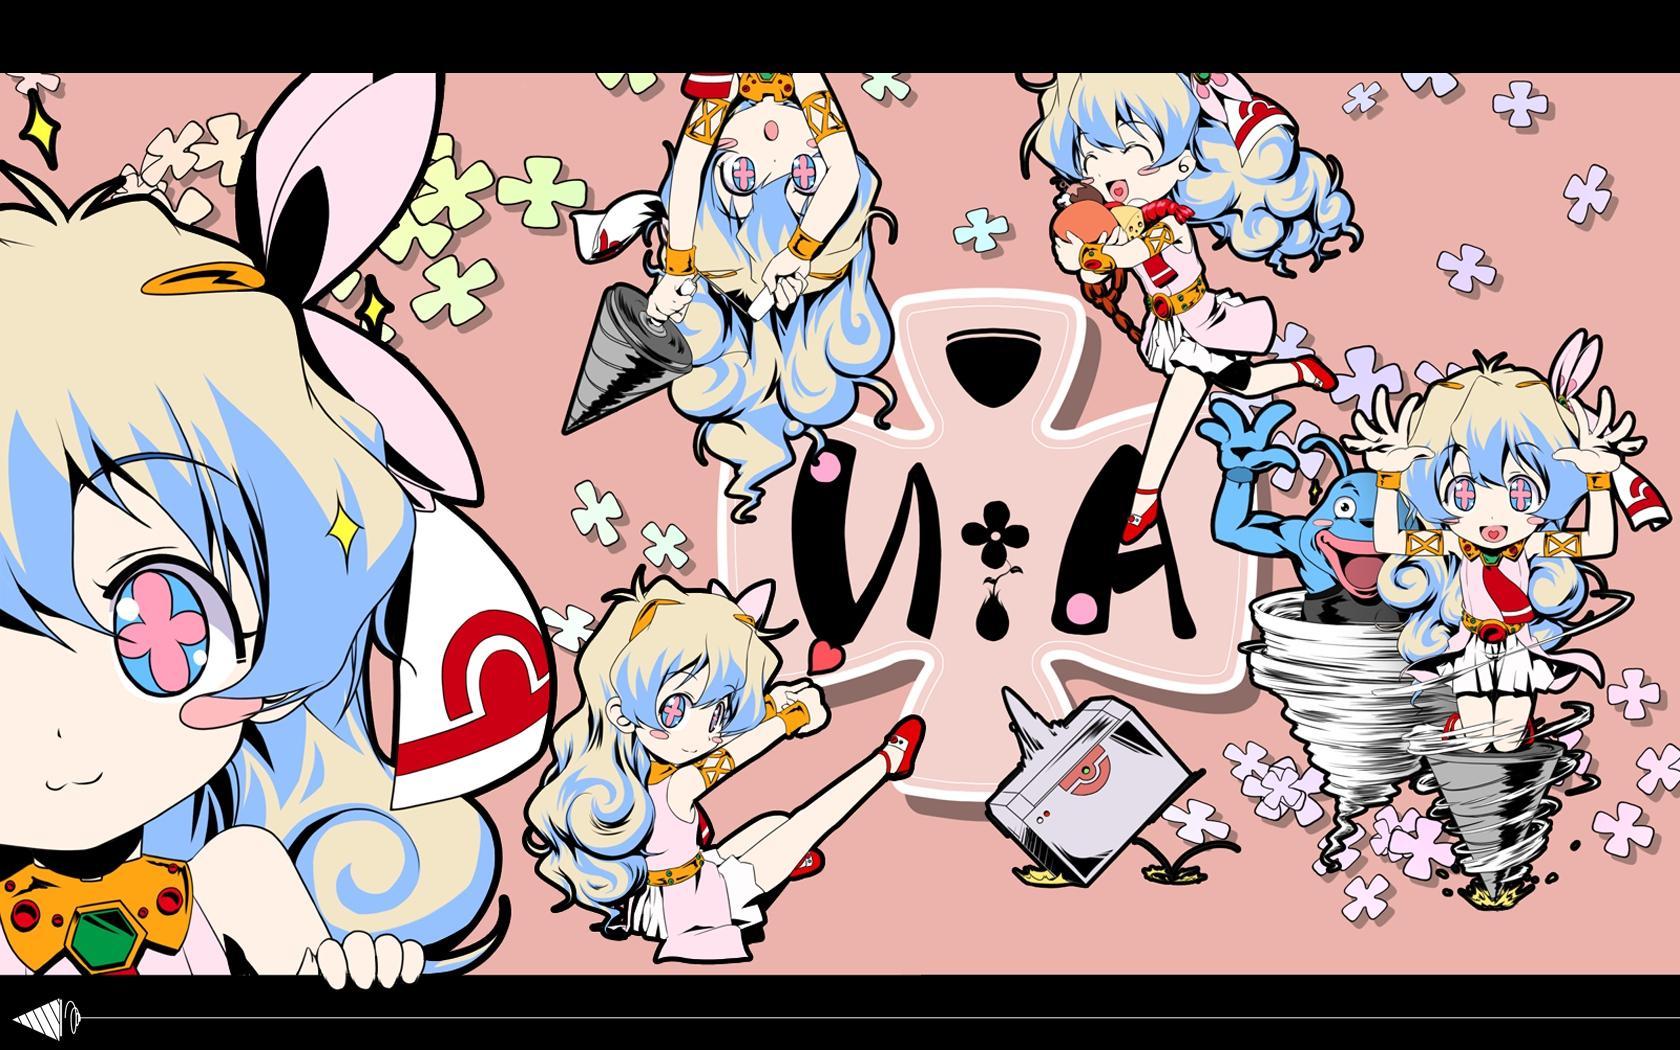 chibi crossover gainax nia_teppelin pink tagme tengen_toppa_gurren_lagann vector